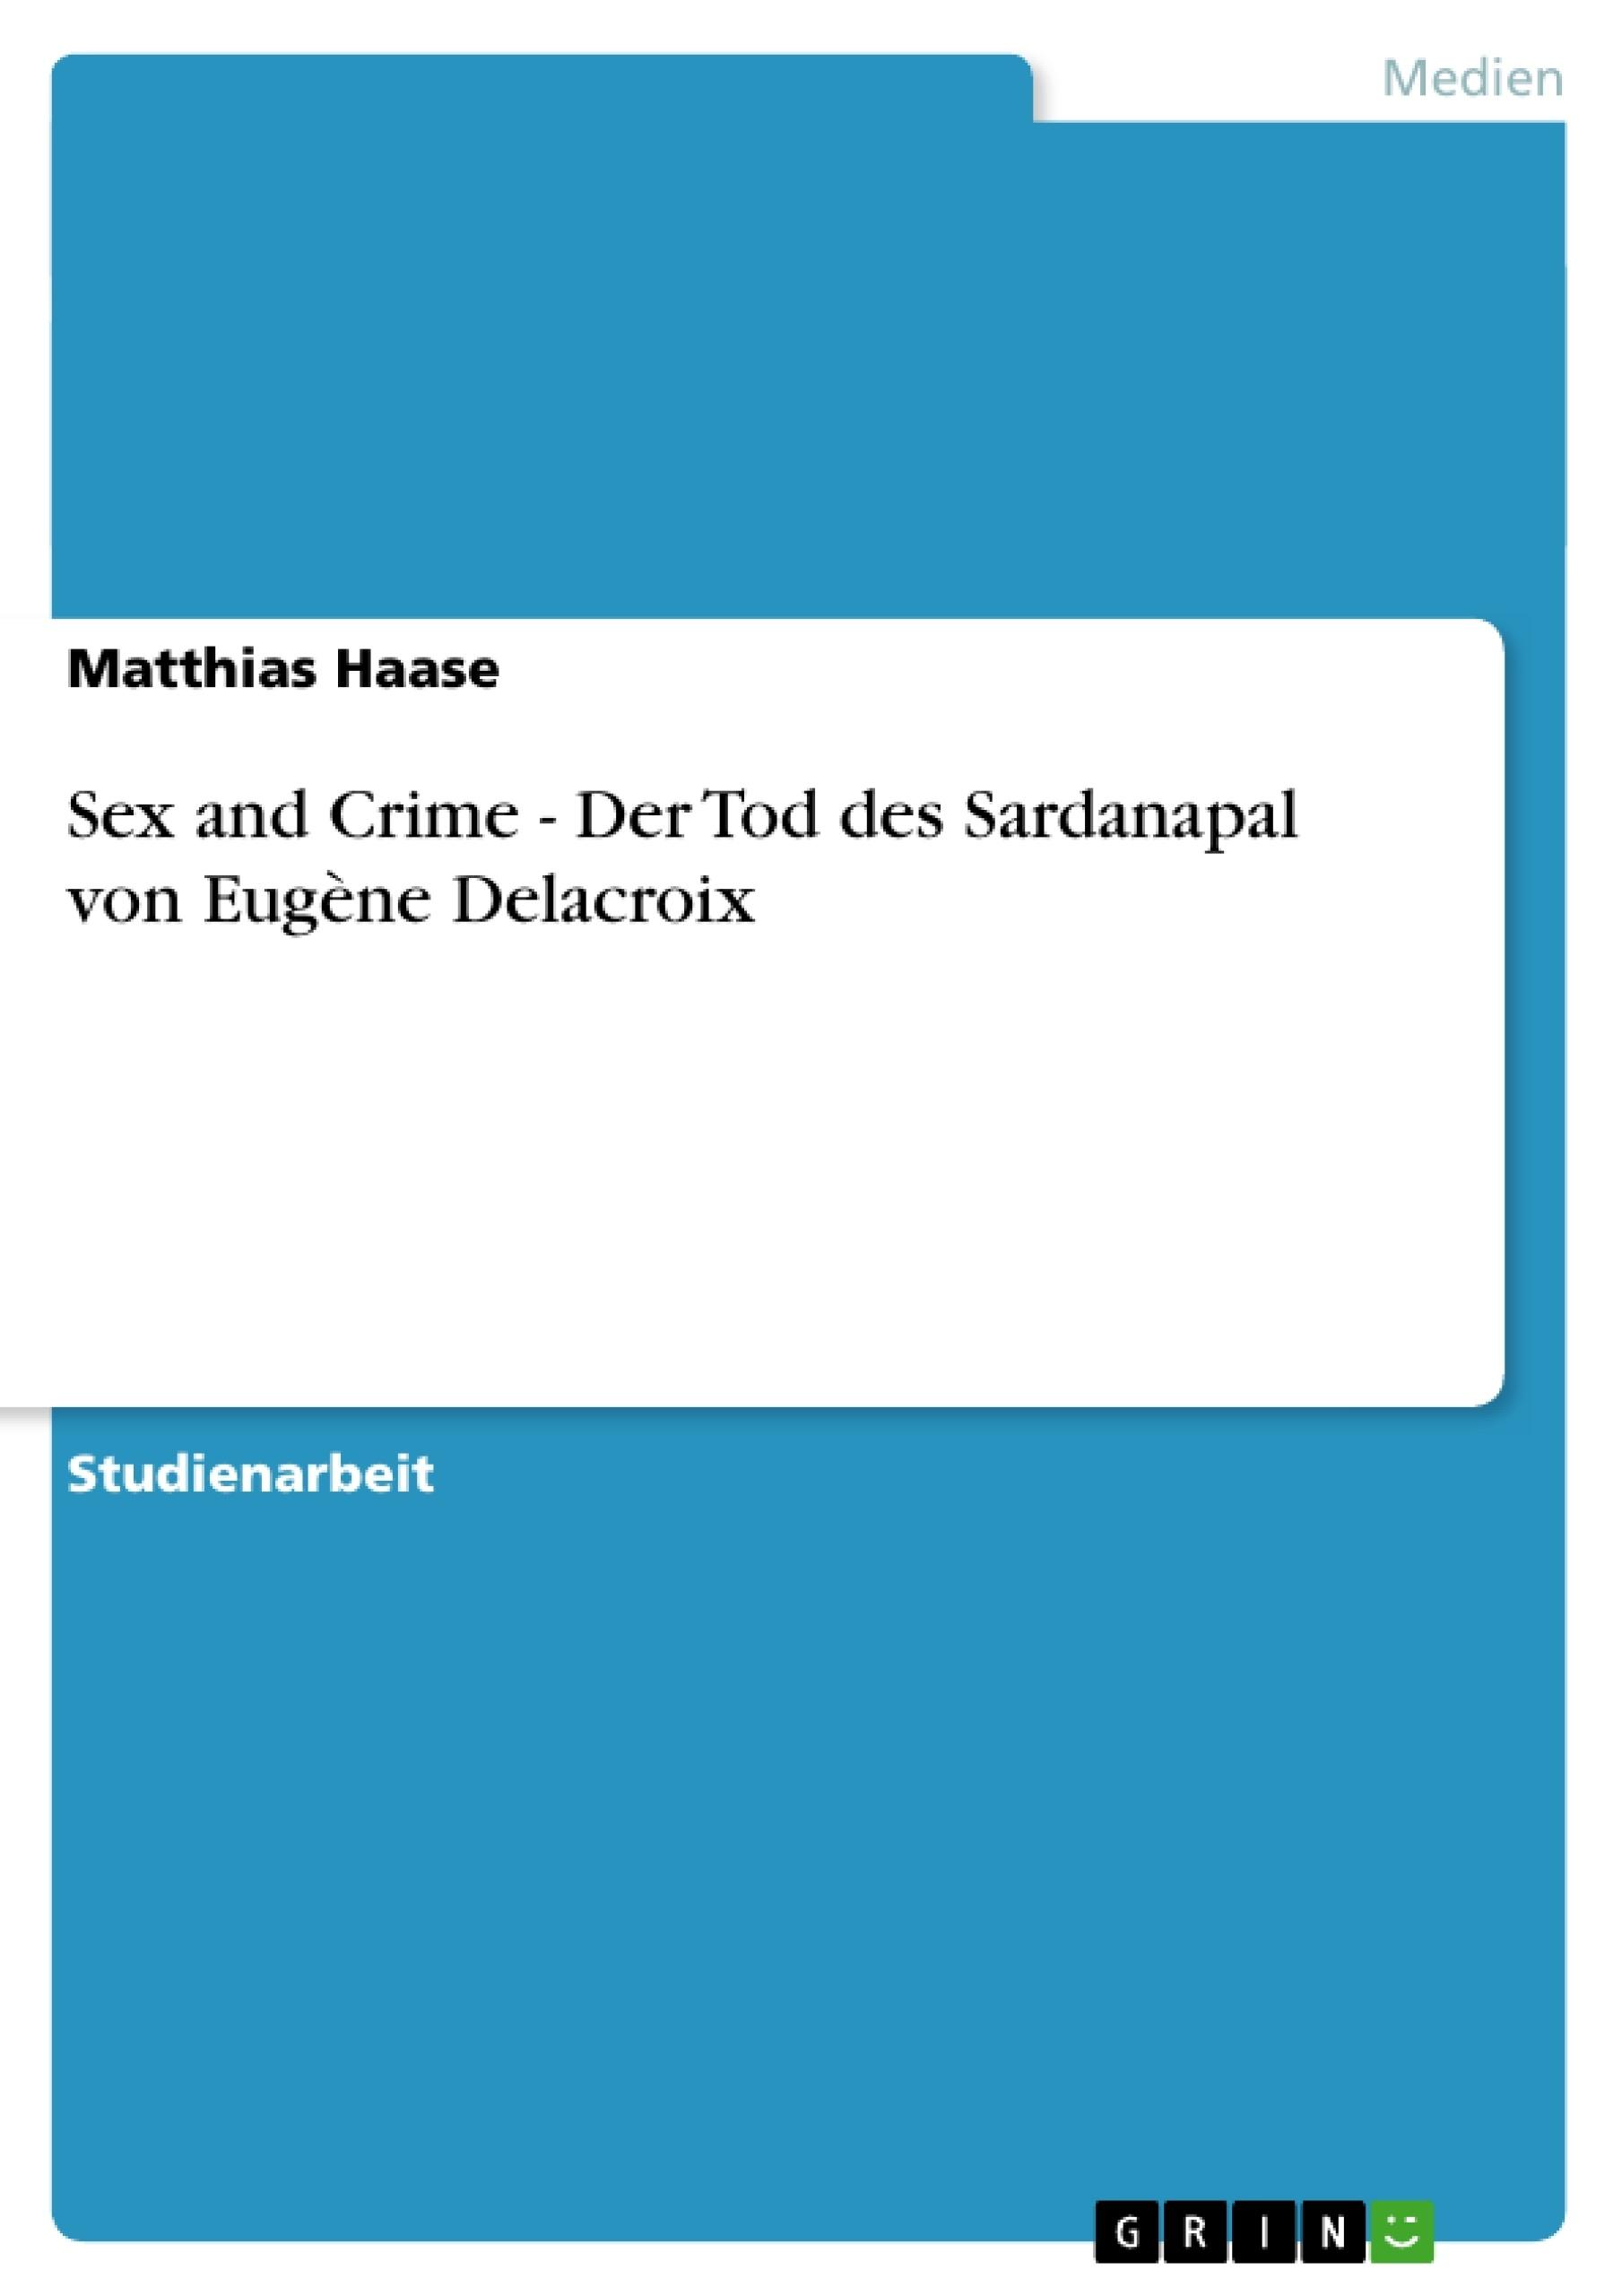 Titel: Sex and Crime -  Der Tod des Sardanapal von Eugène Delacroix